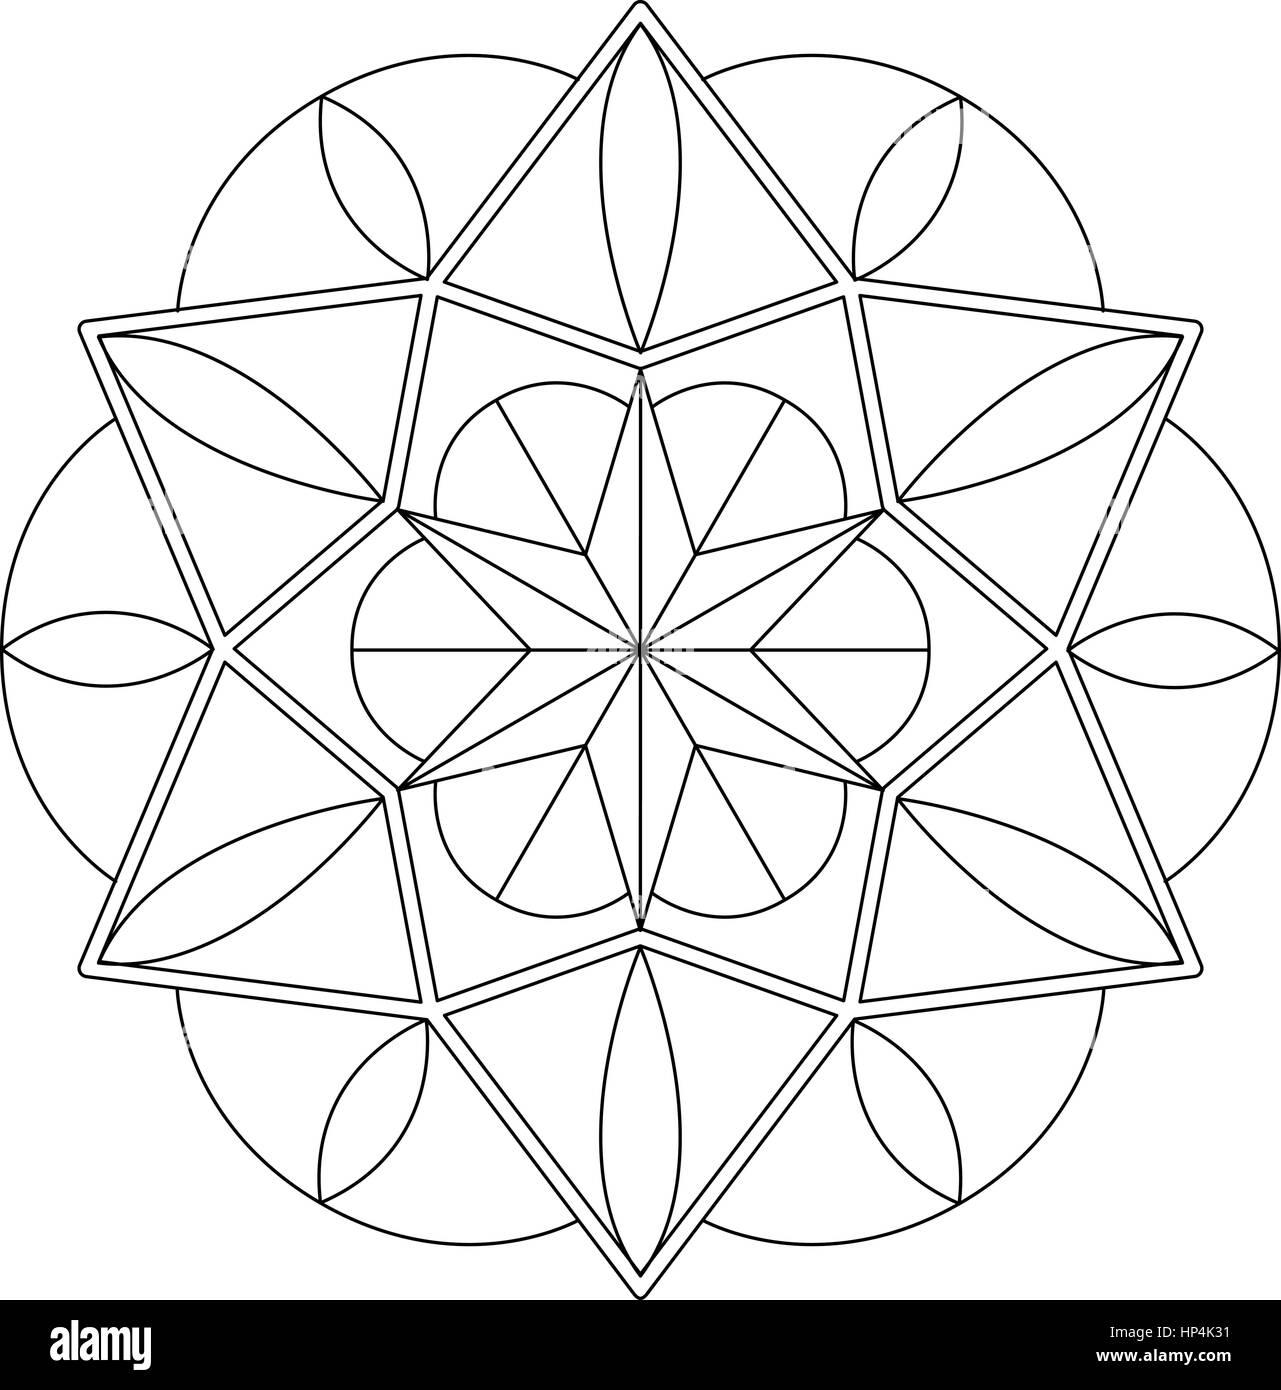 Geometric mandala for coloring - Stock Image